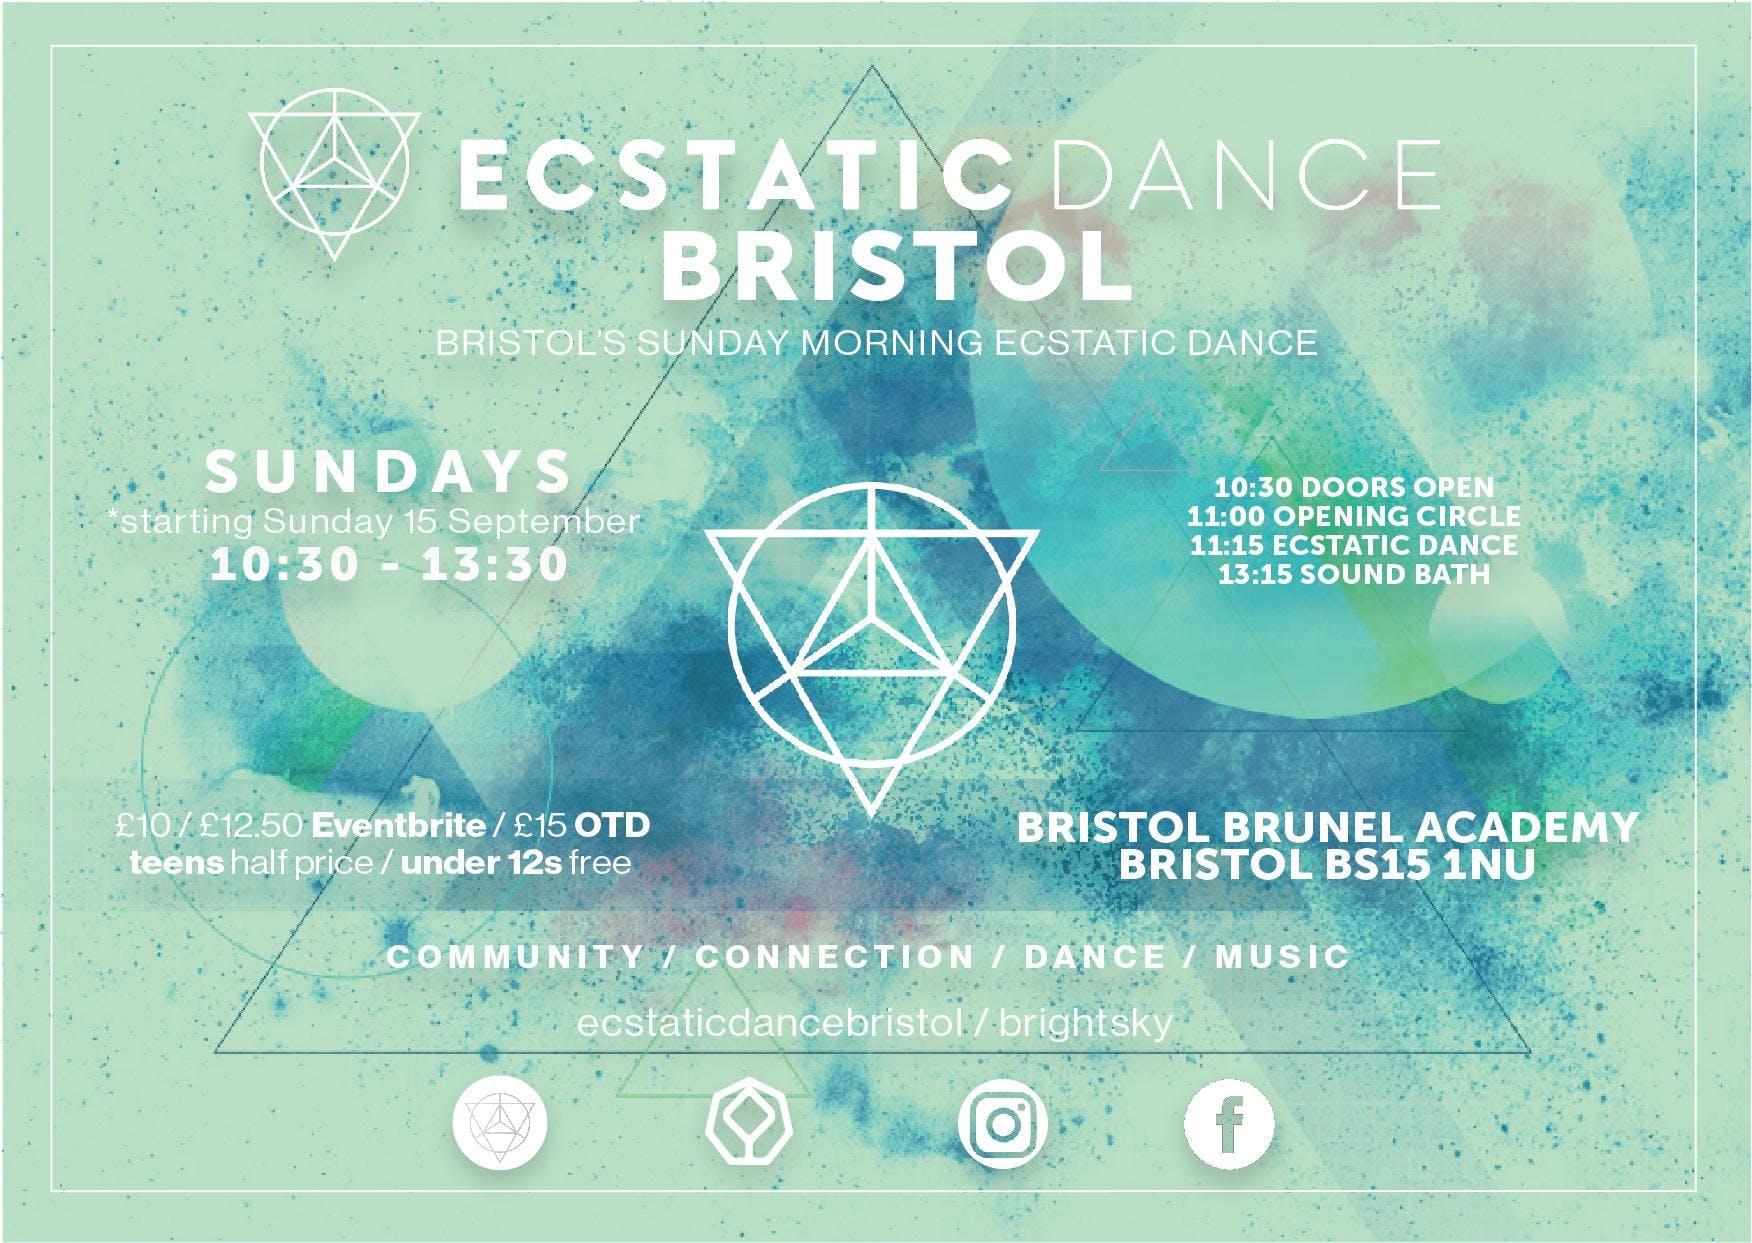 Ecstatic Dance Bristol